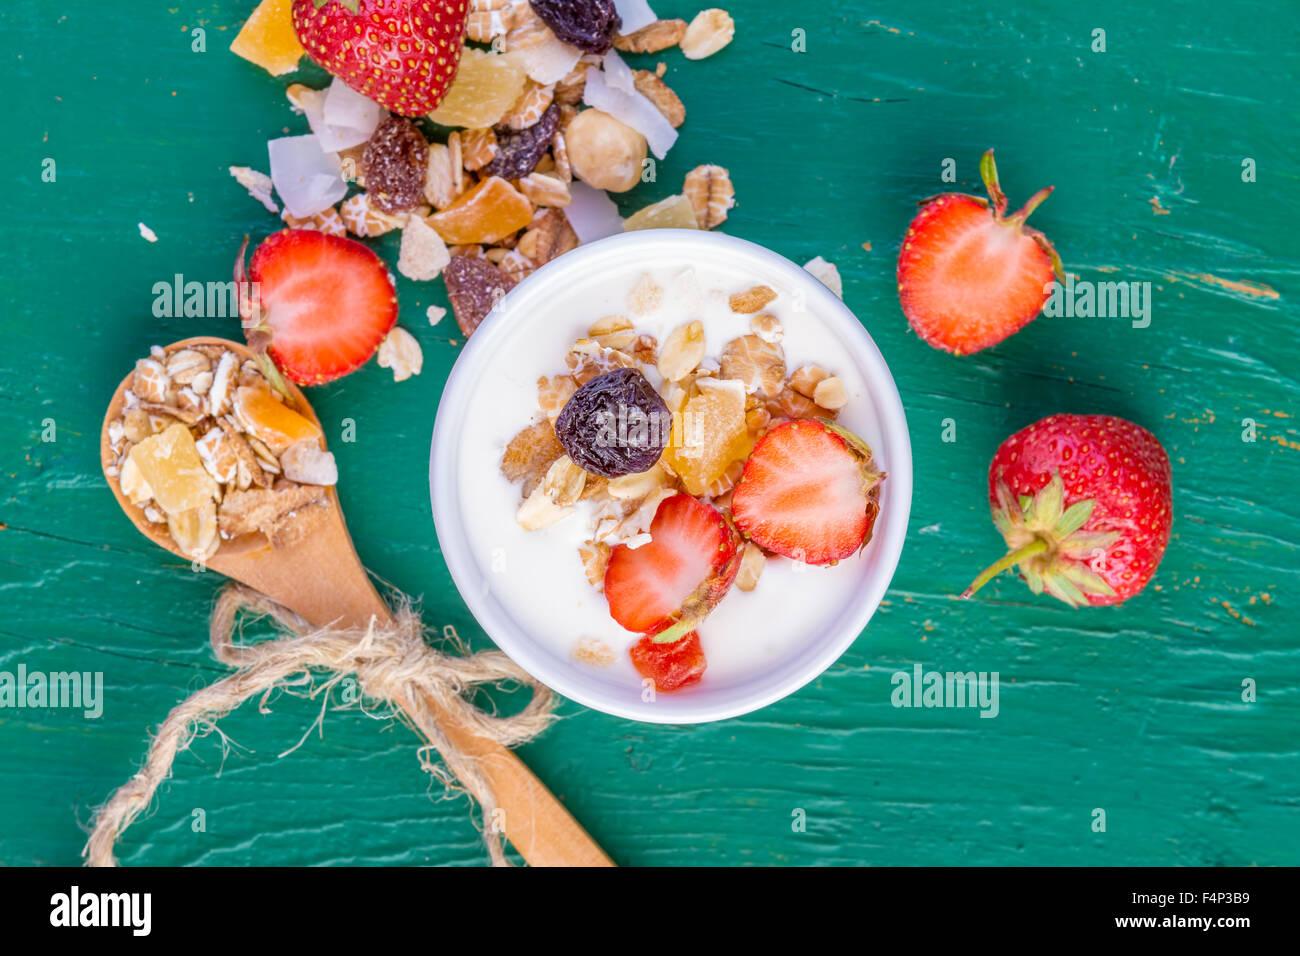 Yogurt with cereals muesli, fresh strawberries, banana and raisins in bowl on wooden background - Stock Image